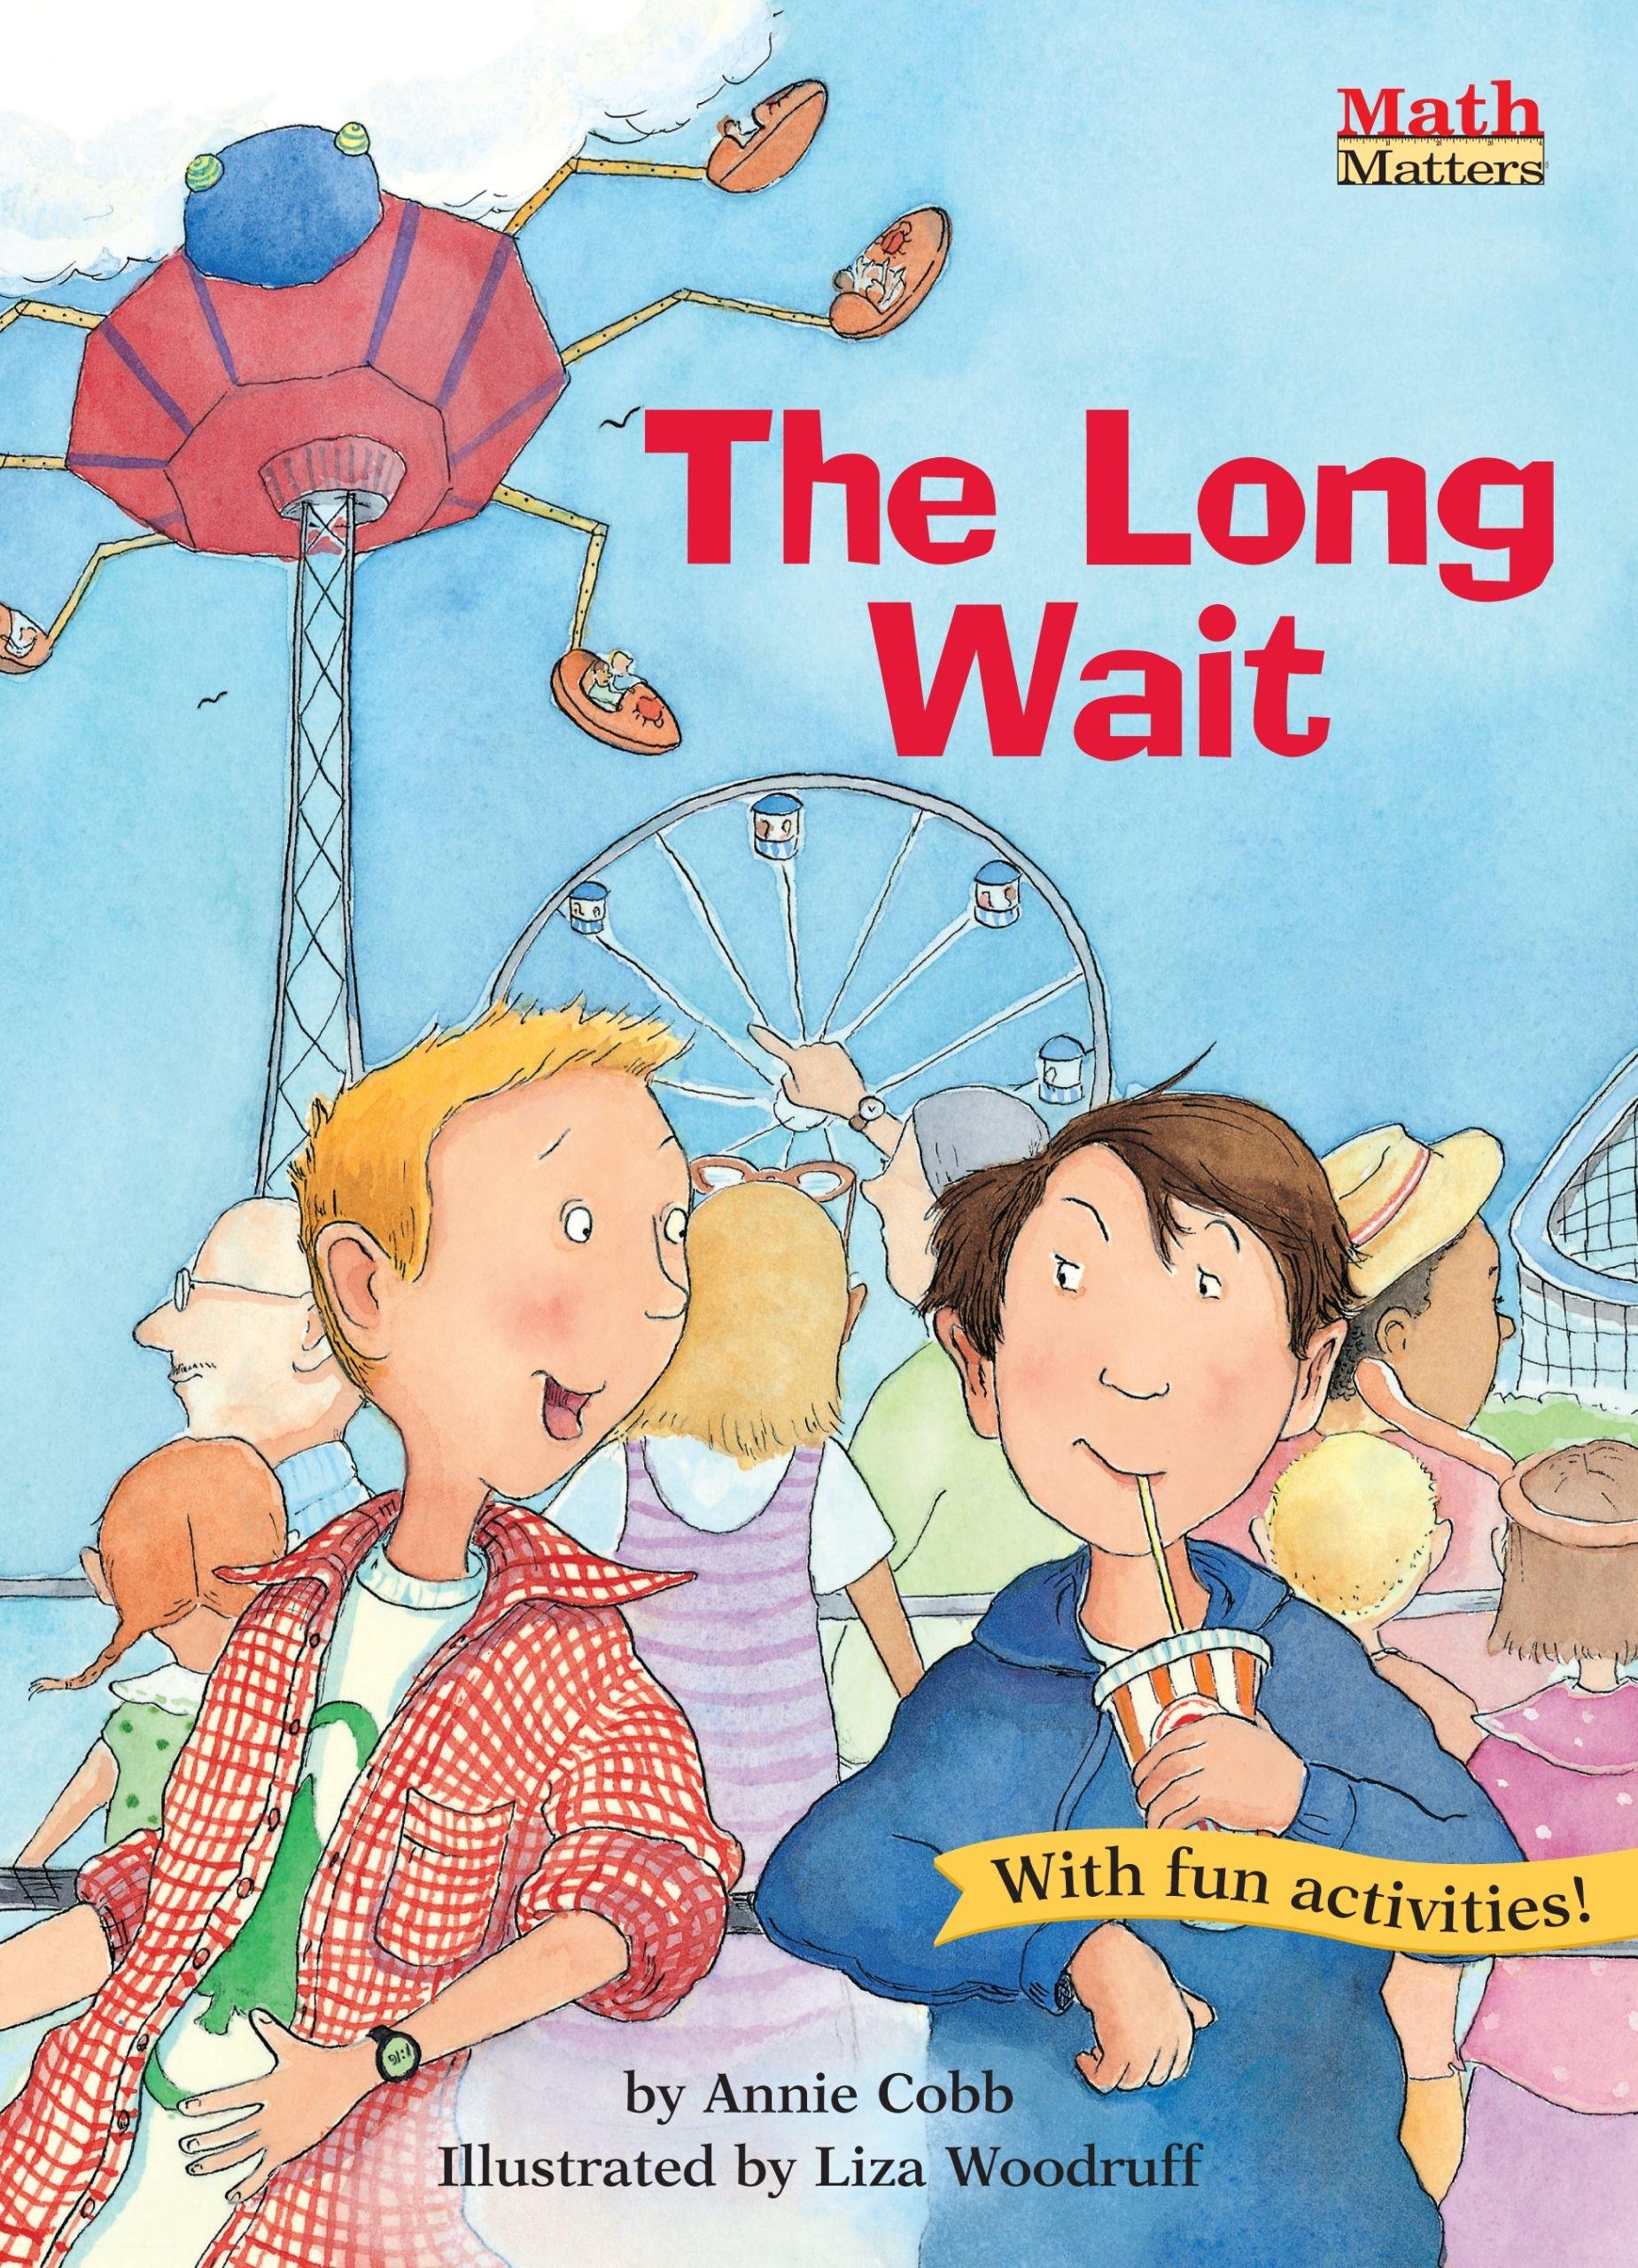 Download The Long Wait (Math Matters) PDF